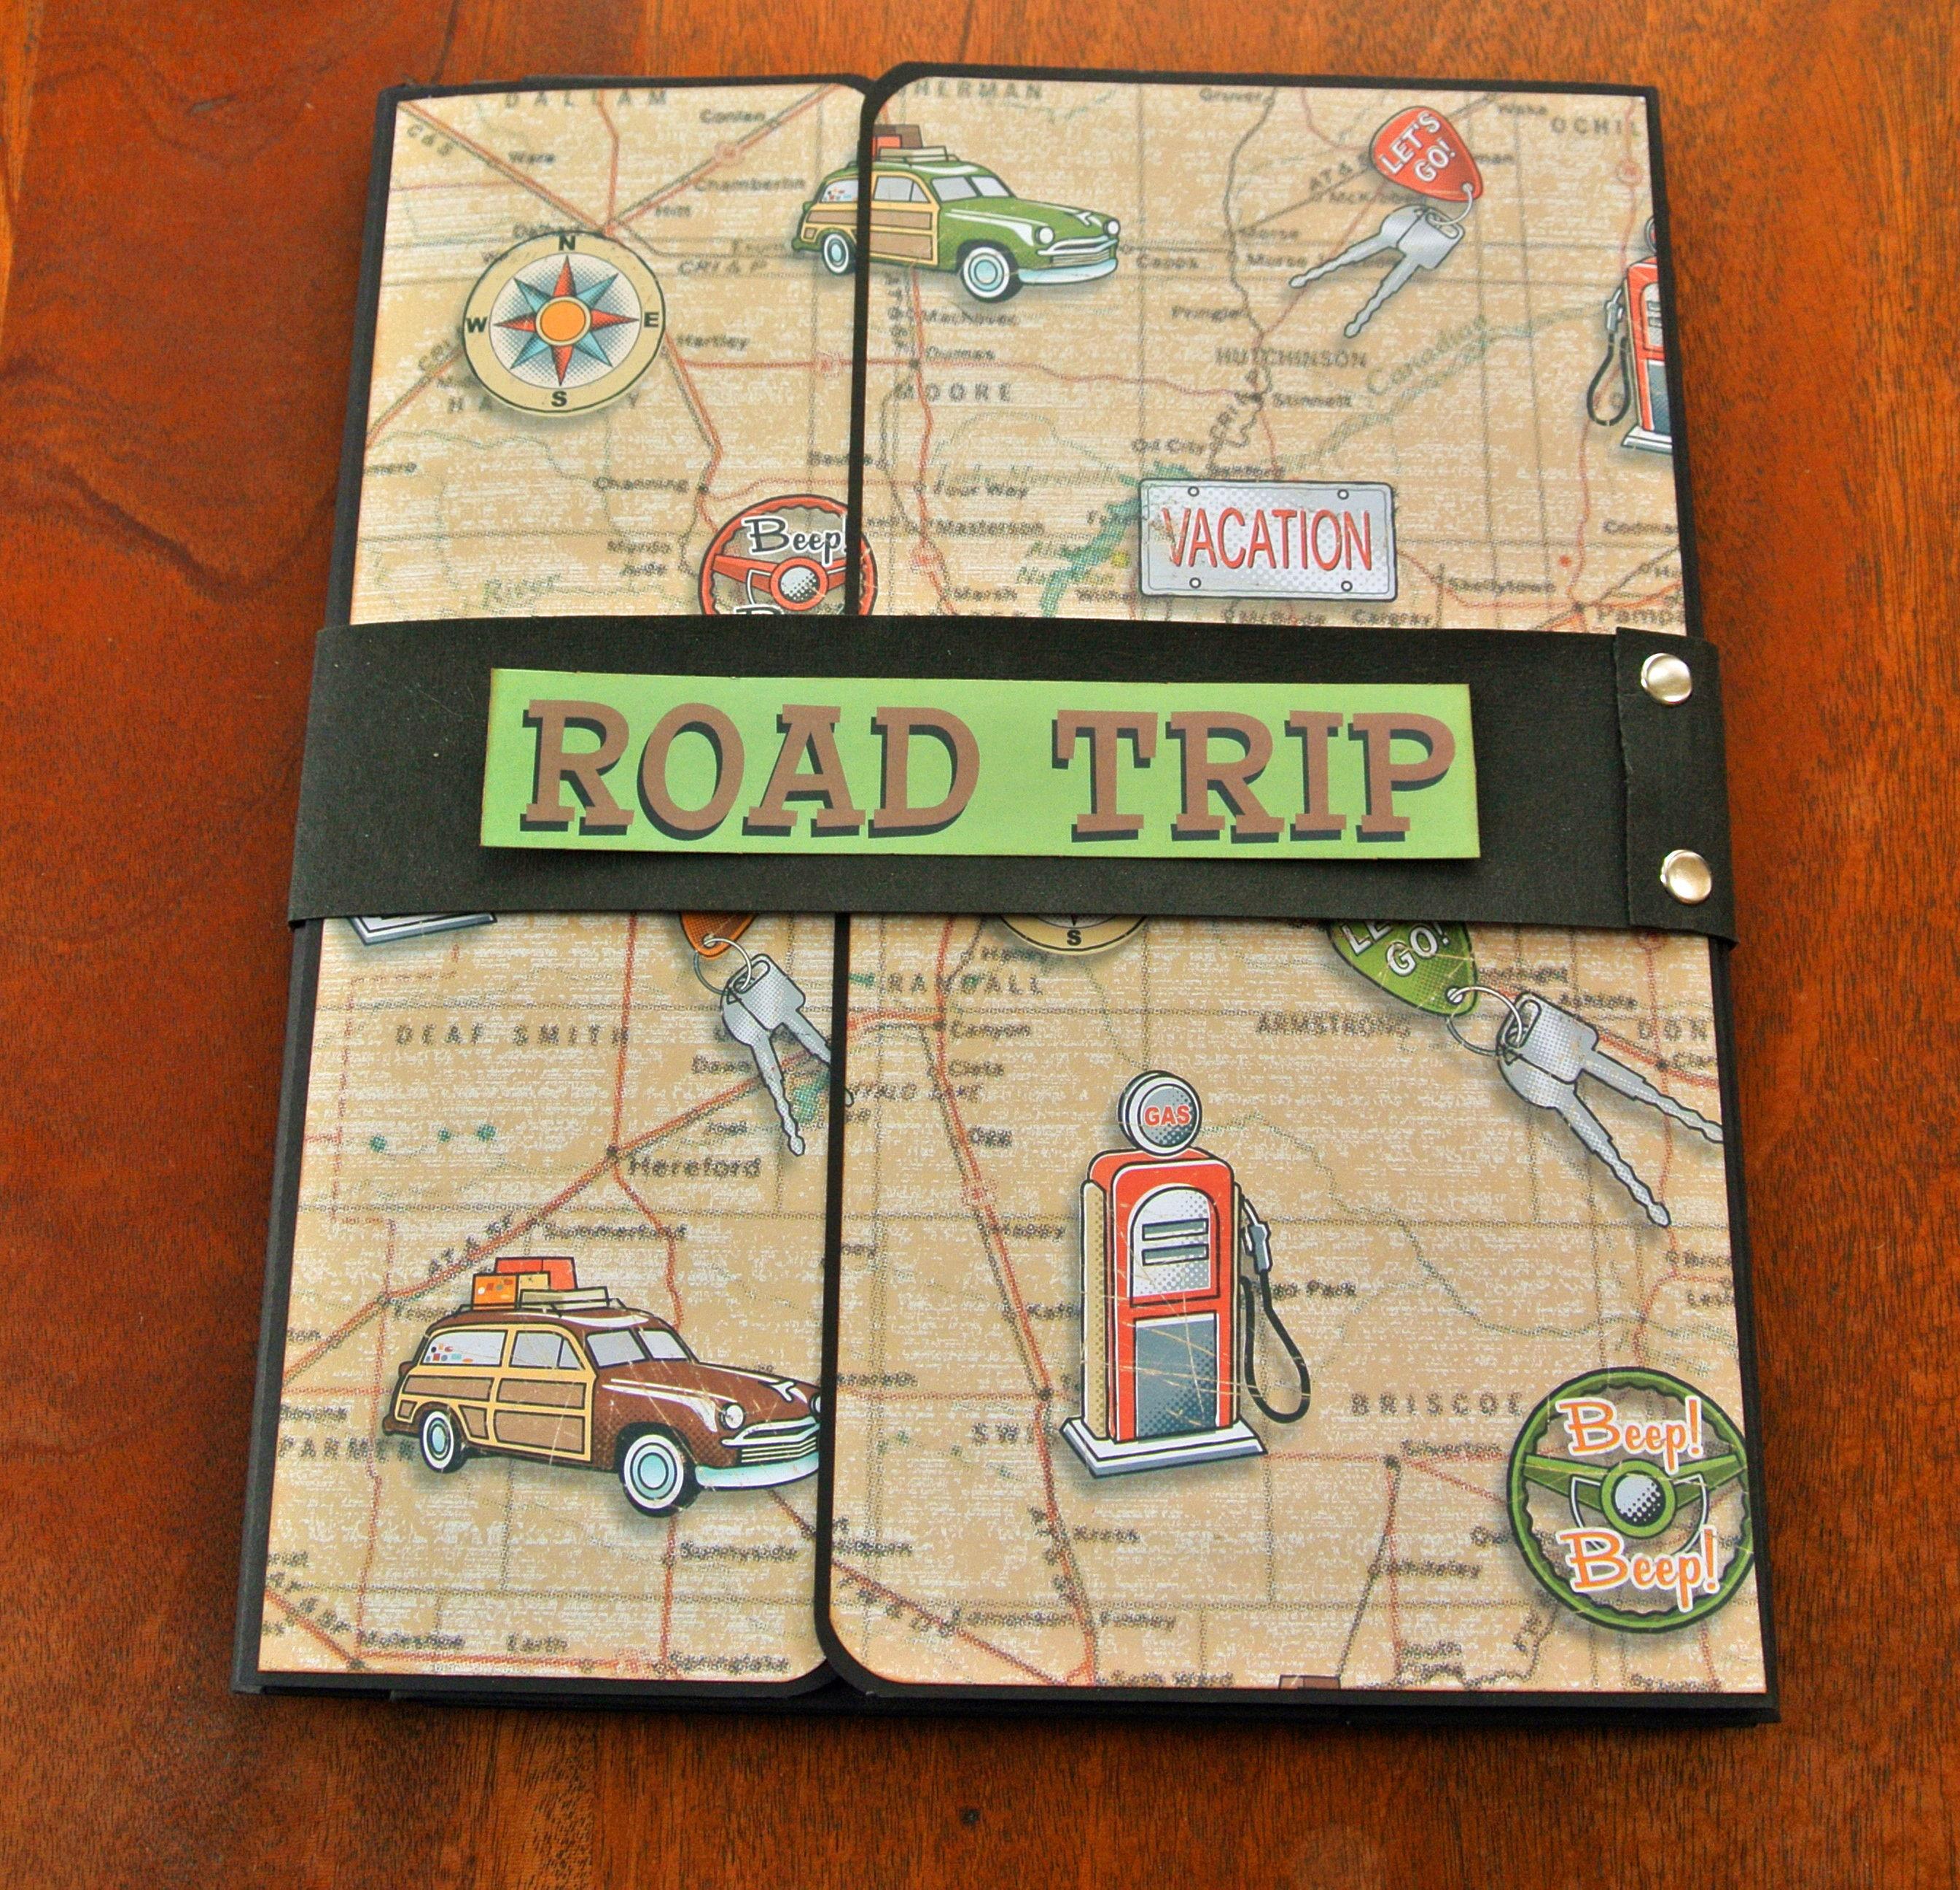 travel gift travel album travel journal road trip folio style scrapbook album from. Black Bedroom Furniture Sets. Home Design Ideas